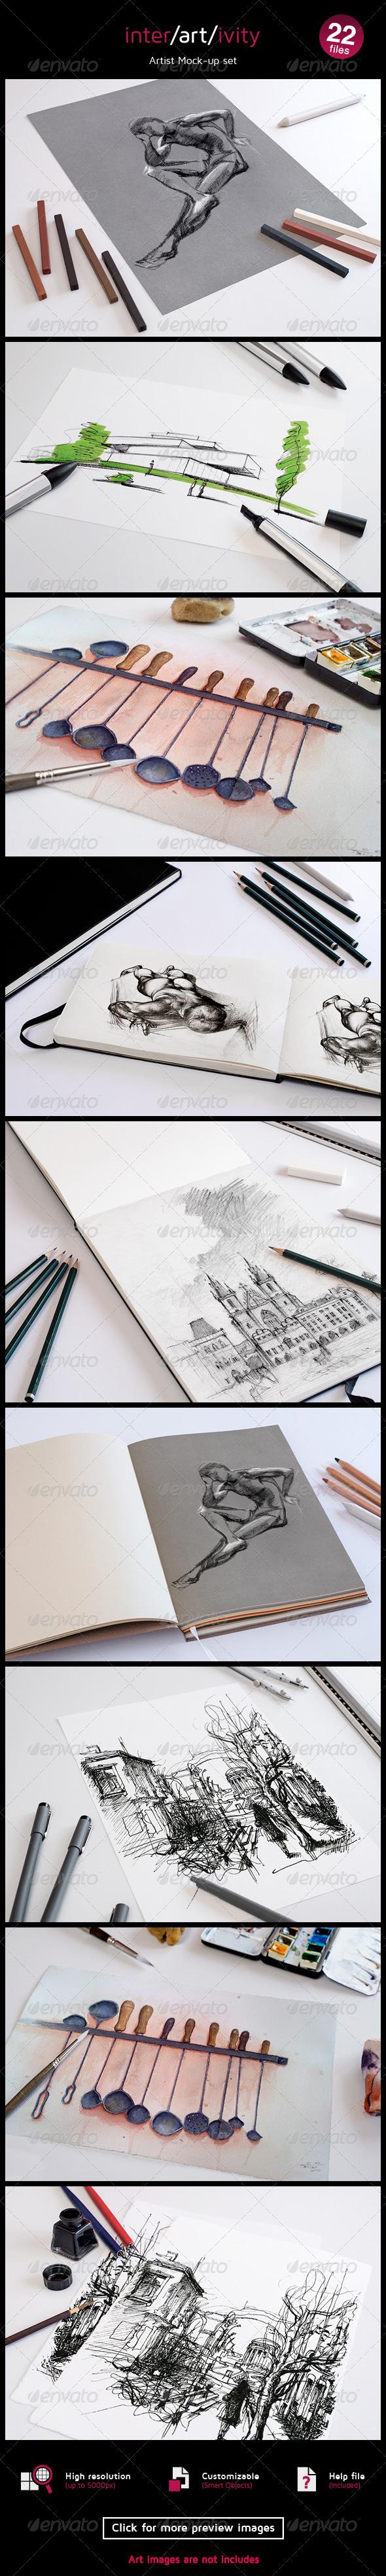 GraphicRiver Graphic Artist Mock-up Set 8180814